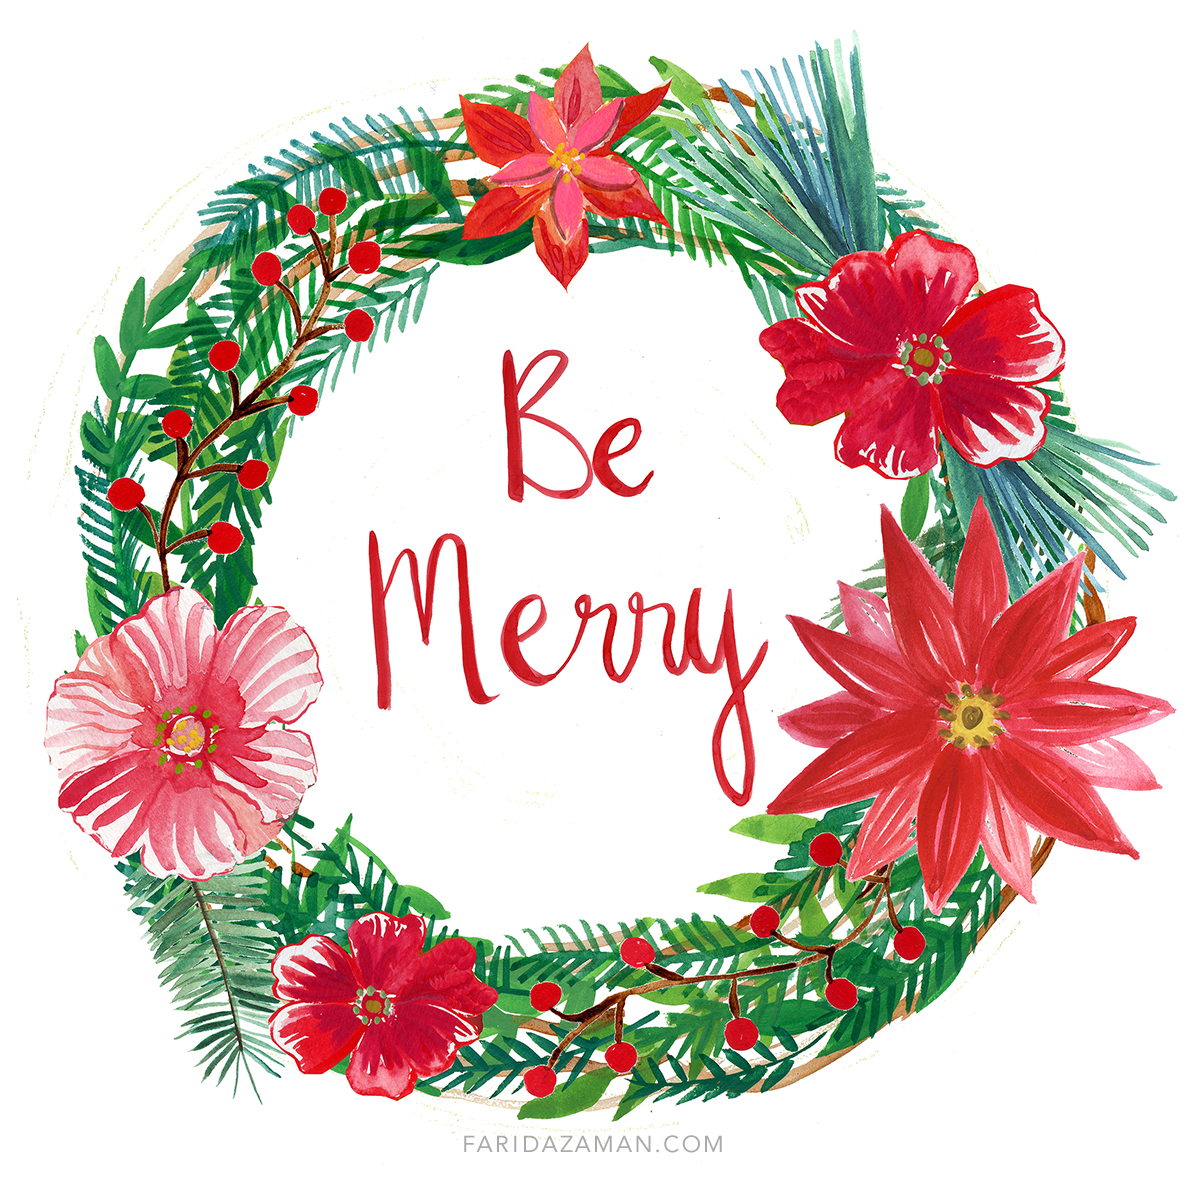 Be Merry wreath150.jpg